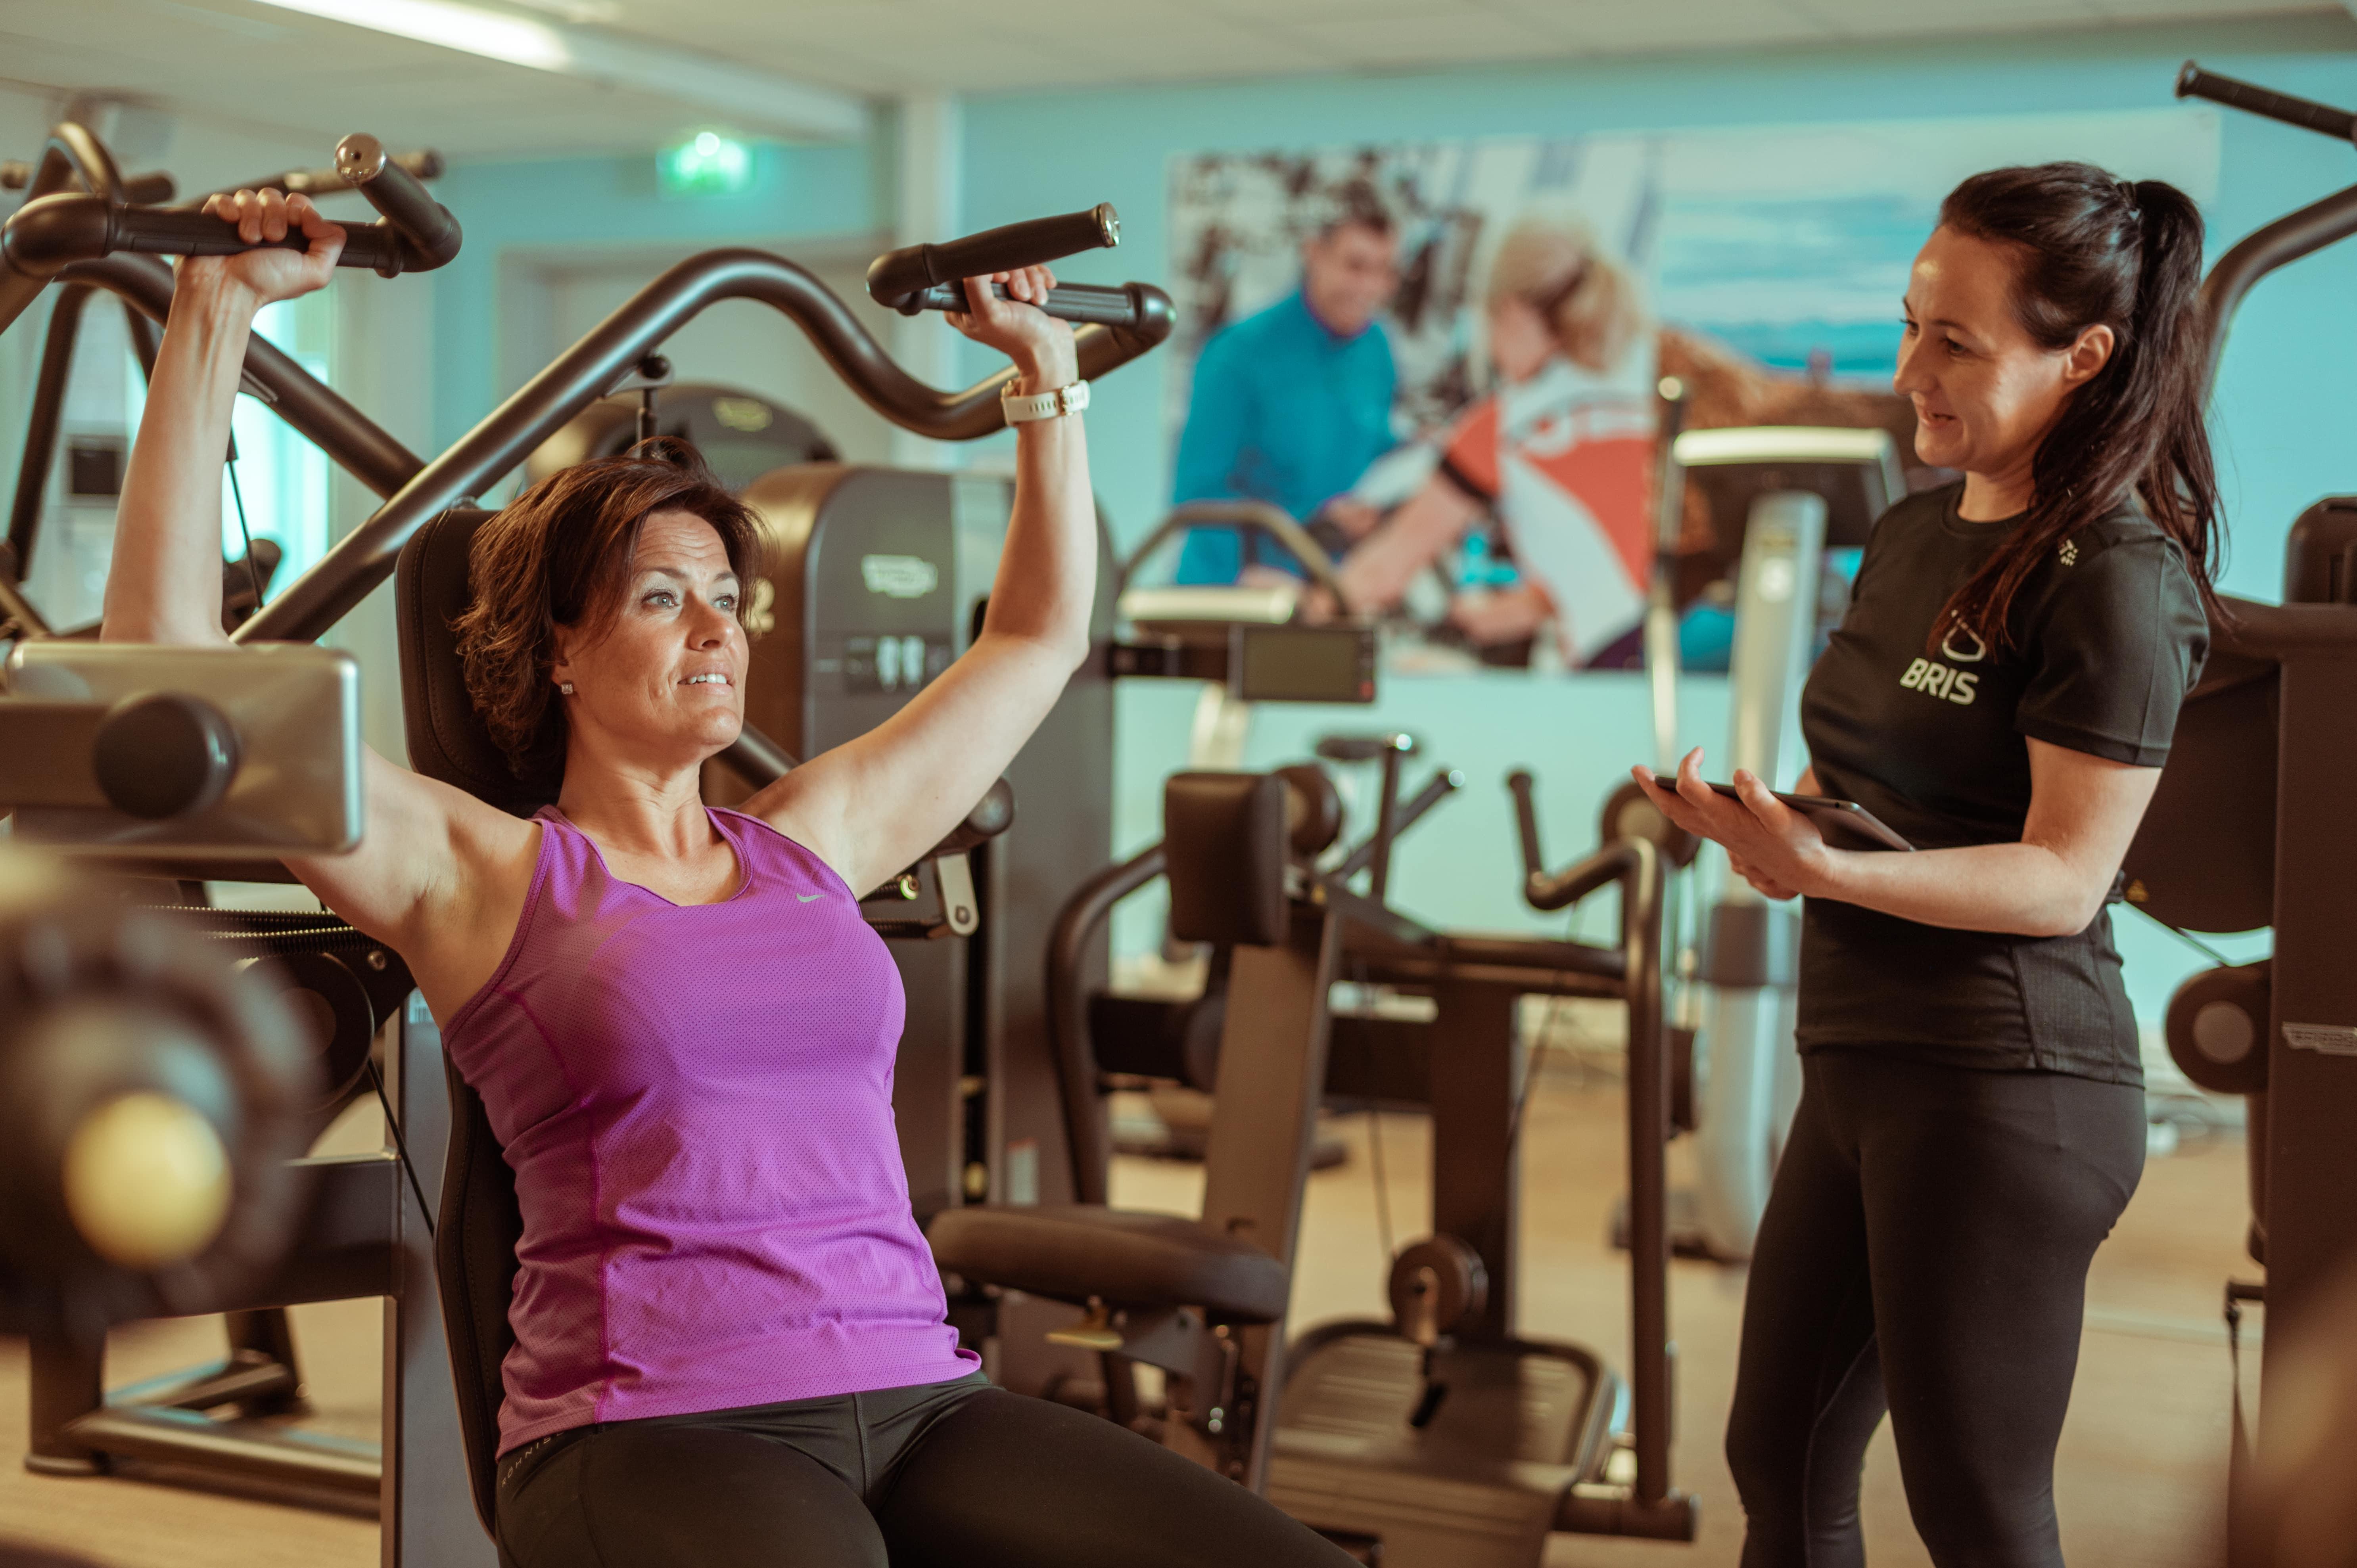 15 Uker til bedre form og helse